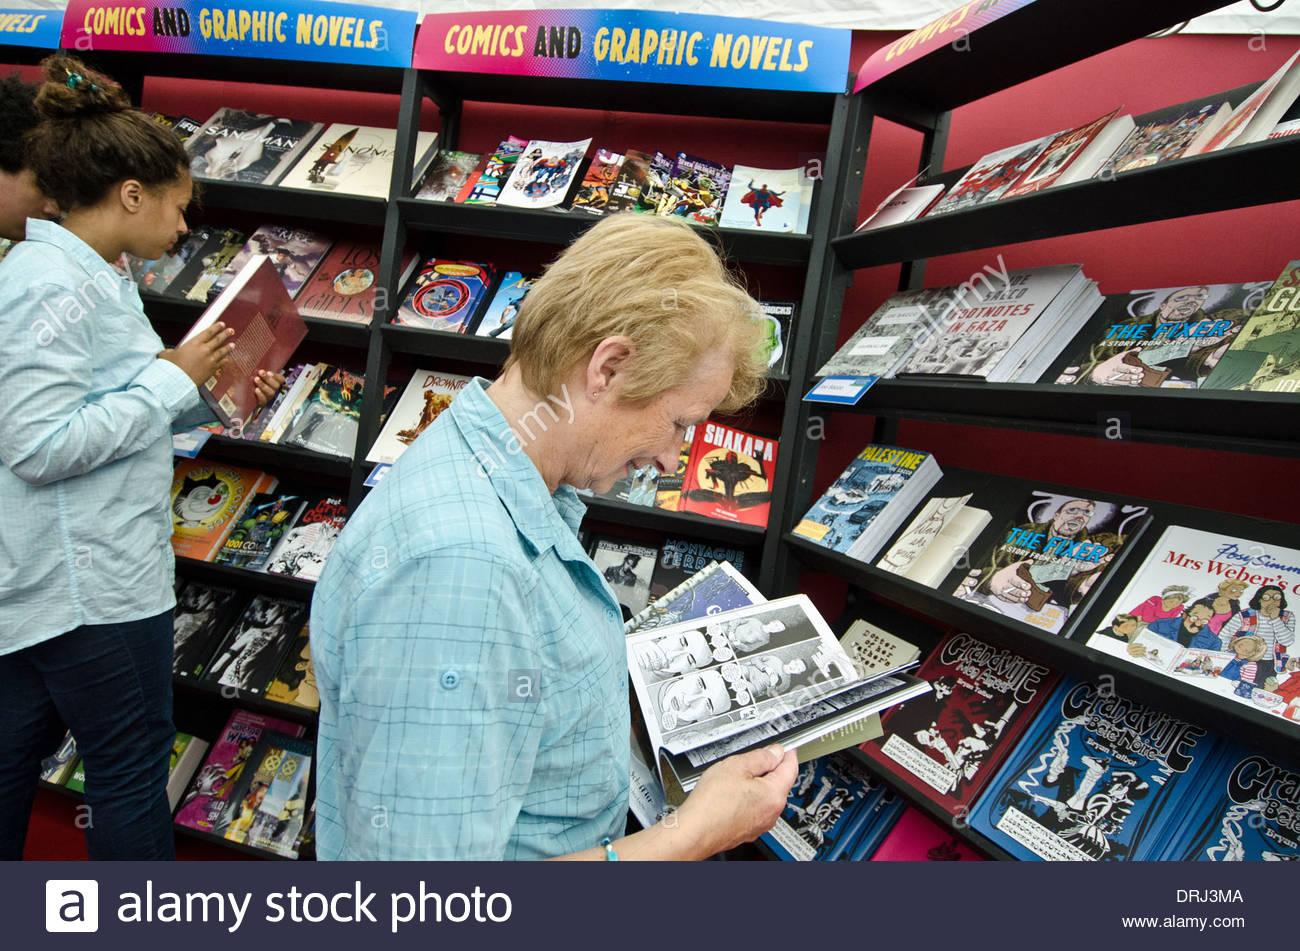 Visitors of the Edinburgh International Book Festival browse comic books in the 'bookshop tent' - Stock Image